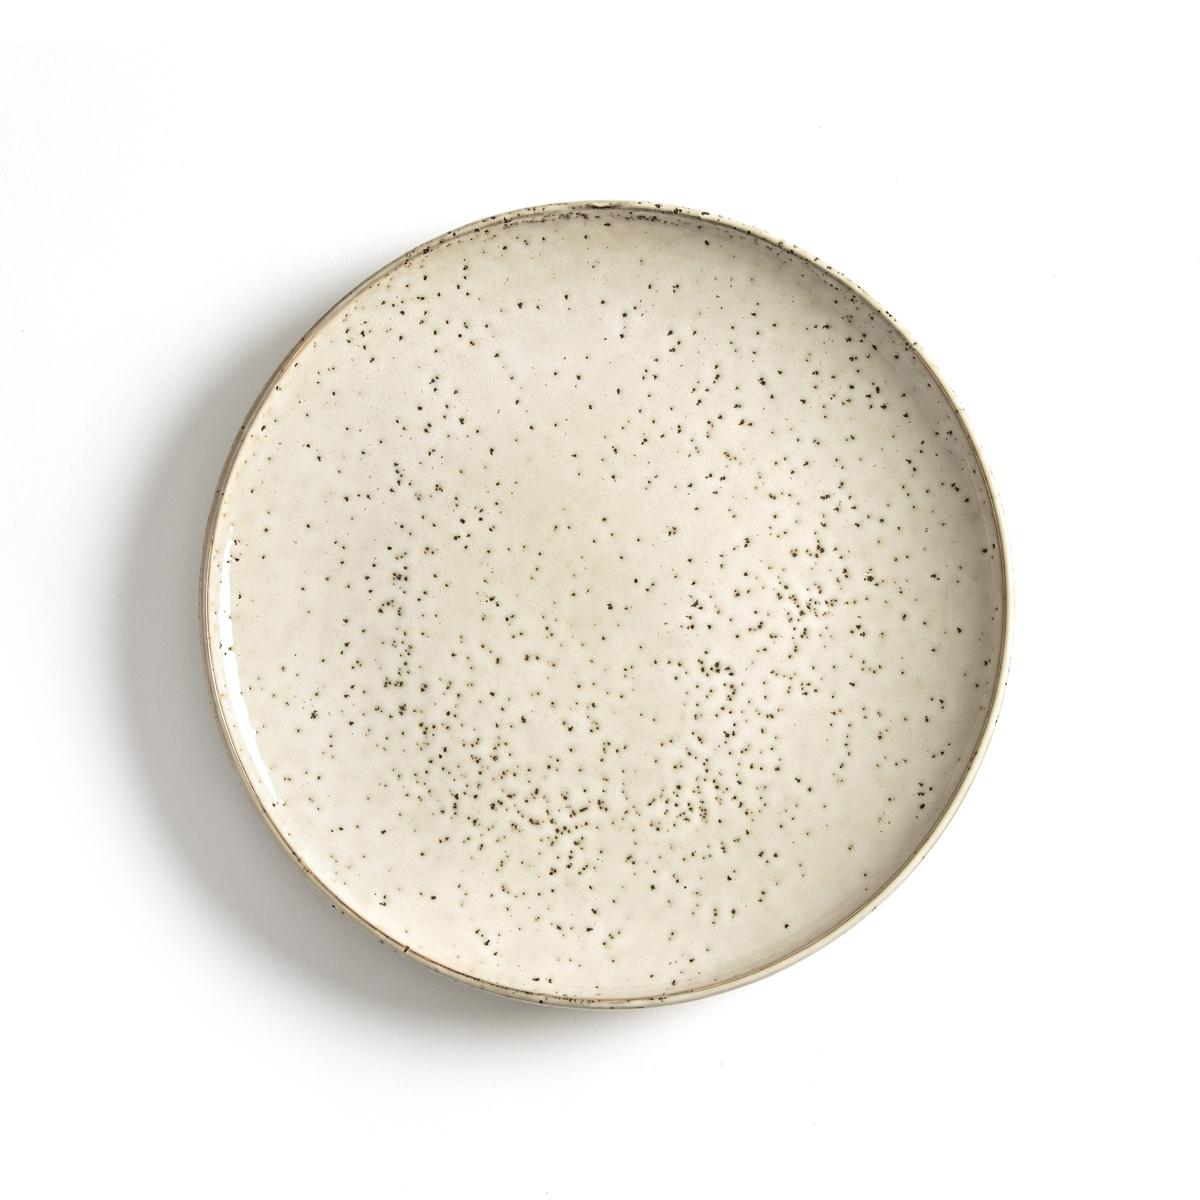 Комплект из 4 мелких тарелок из керамики, Olazhi